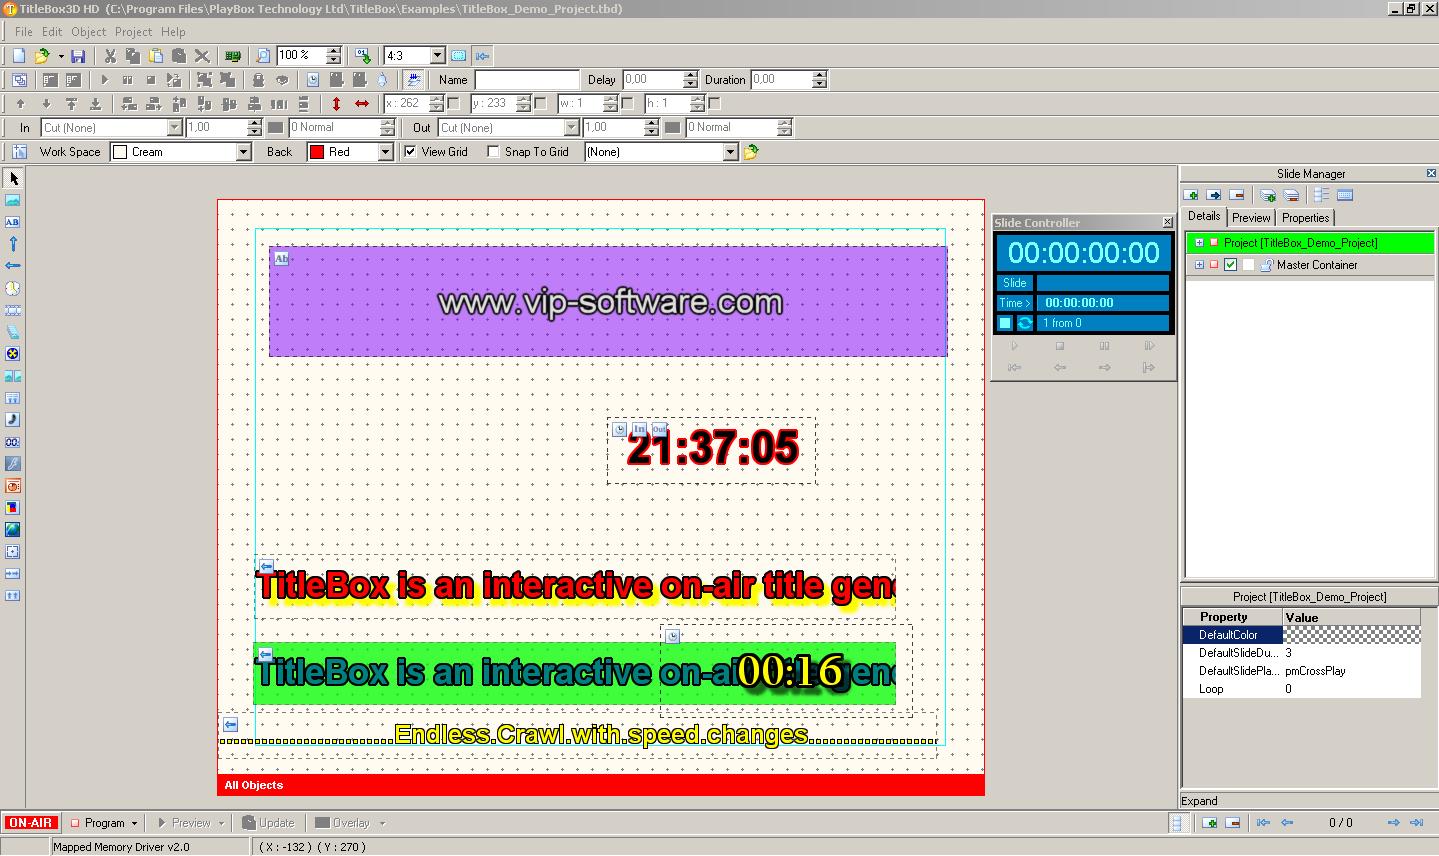 Airbox 4.0.77 1329377407_titlebox1